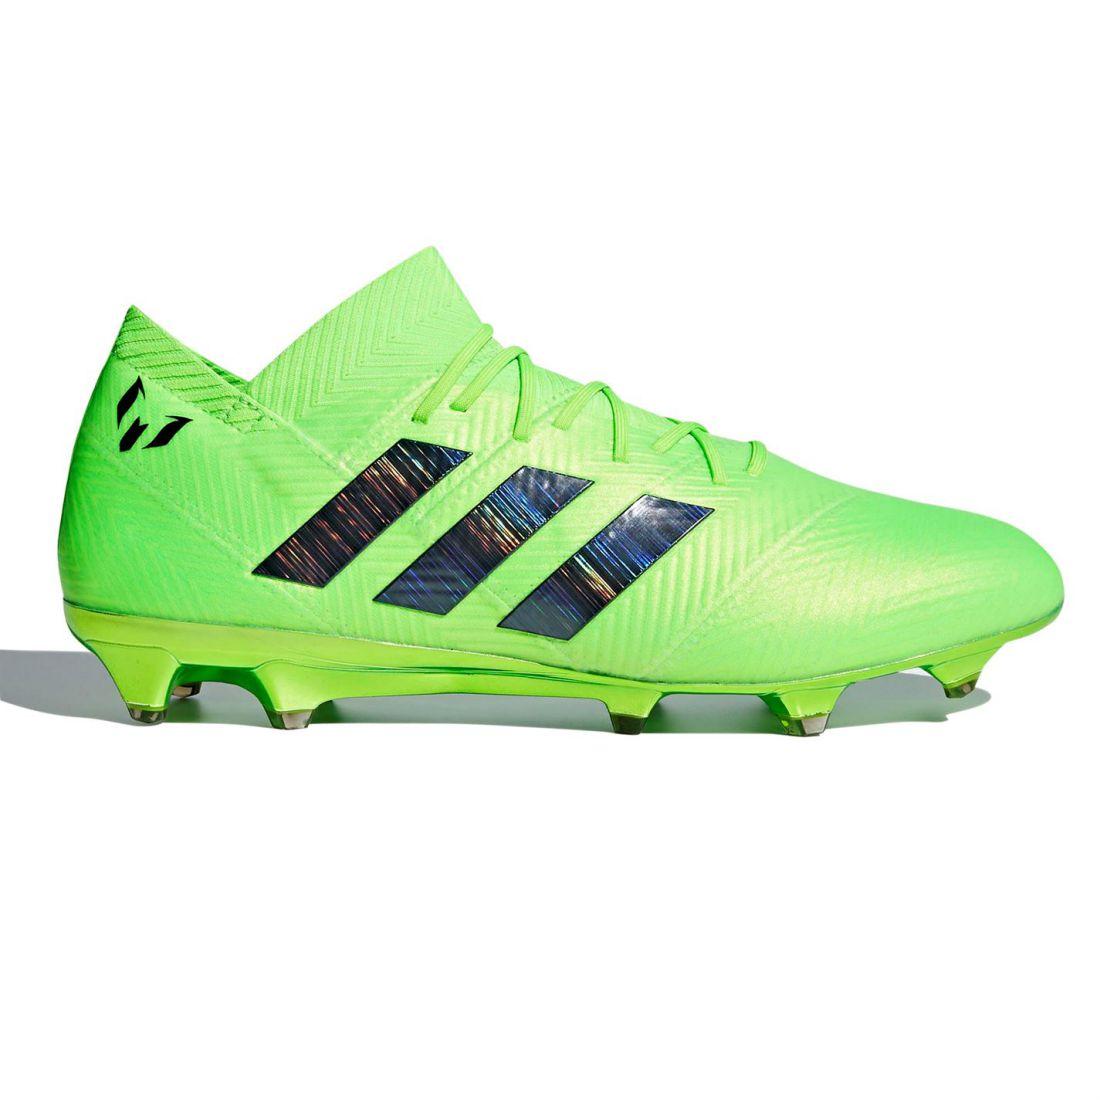 best website 70acc fa523 Image is loading adidas-Nemeziz-Messi-18-1-FG-Football-Boots-